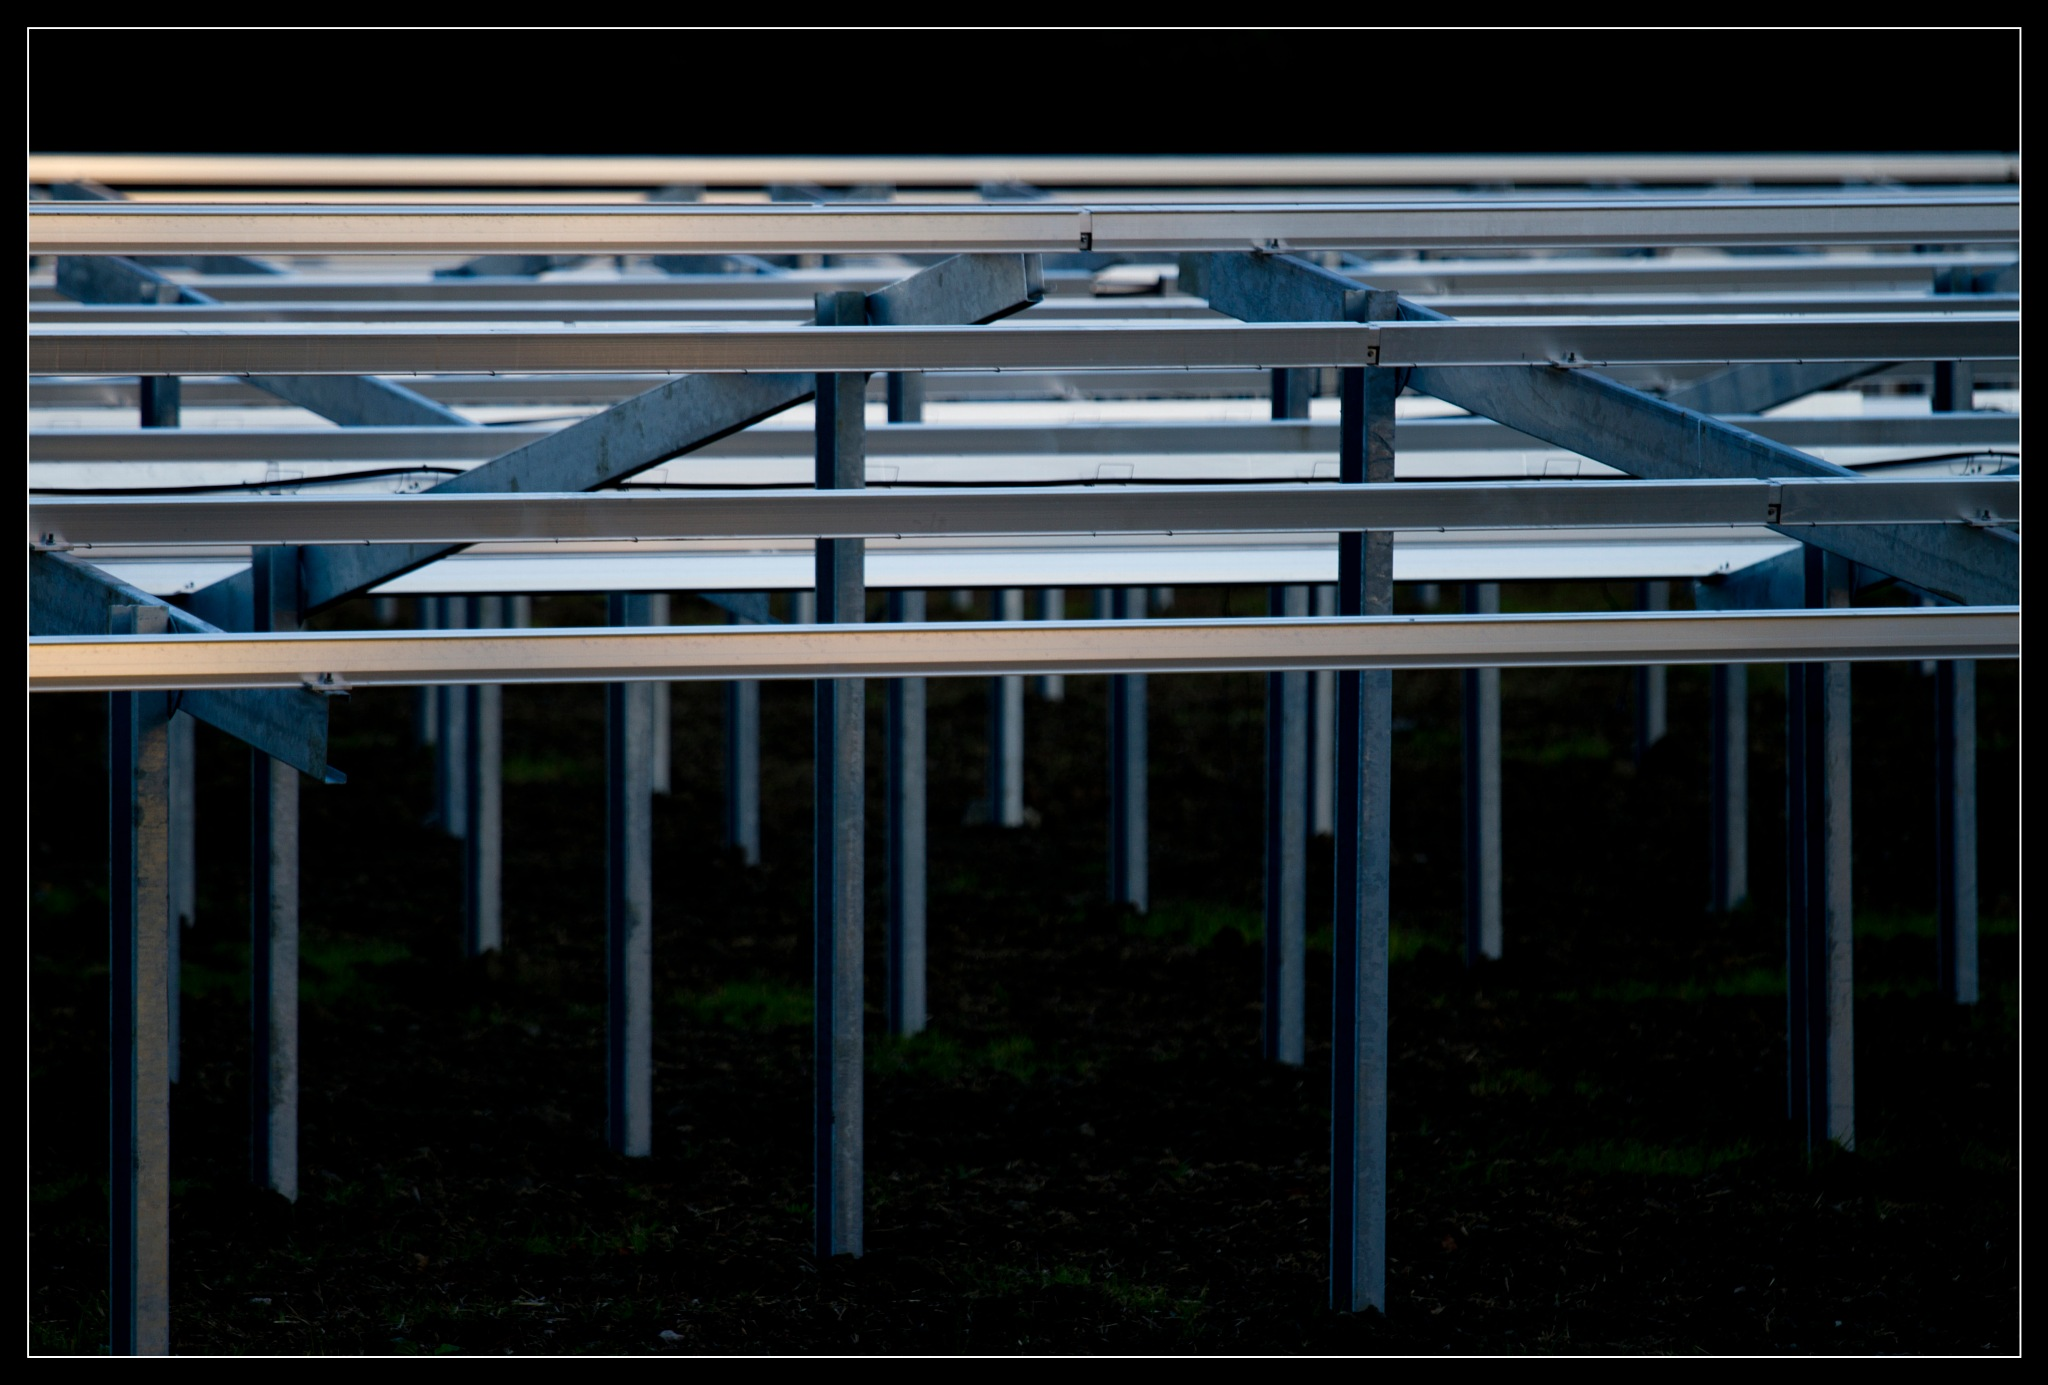 solar power construction site by johan.warta